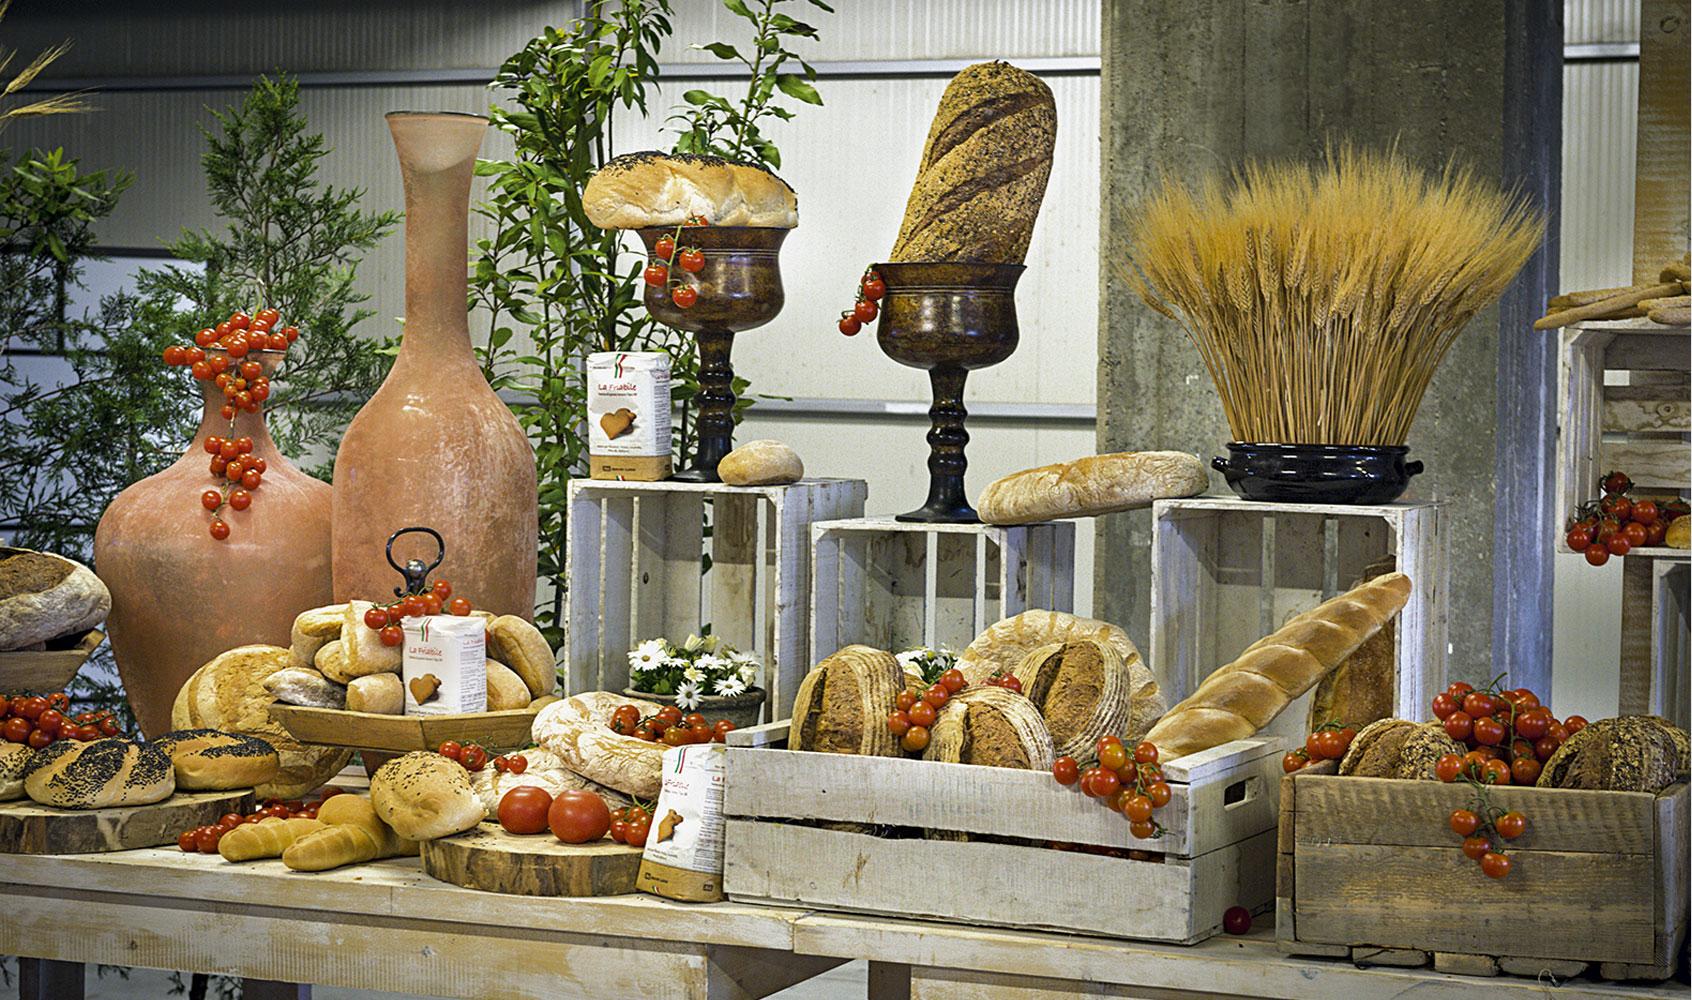 Gustoso angolo del pane